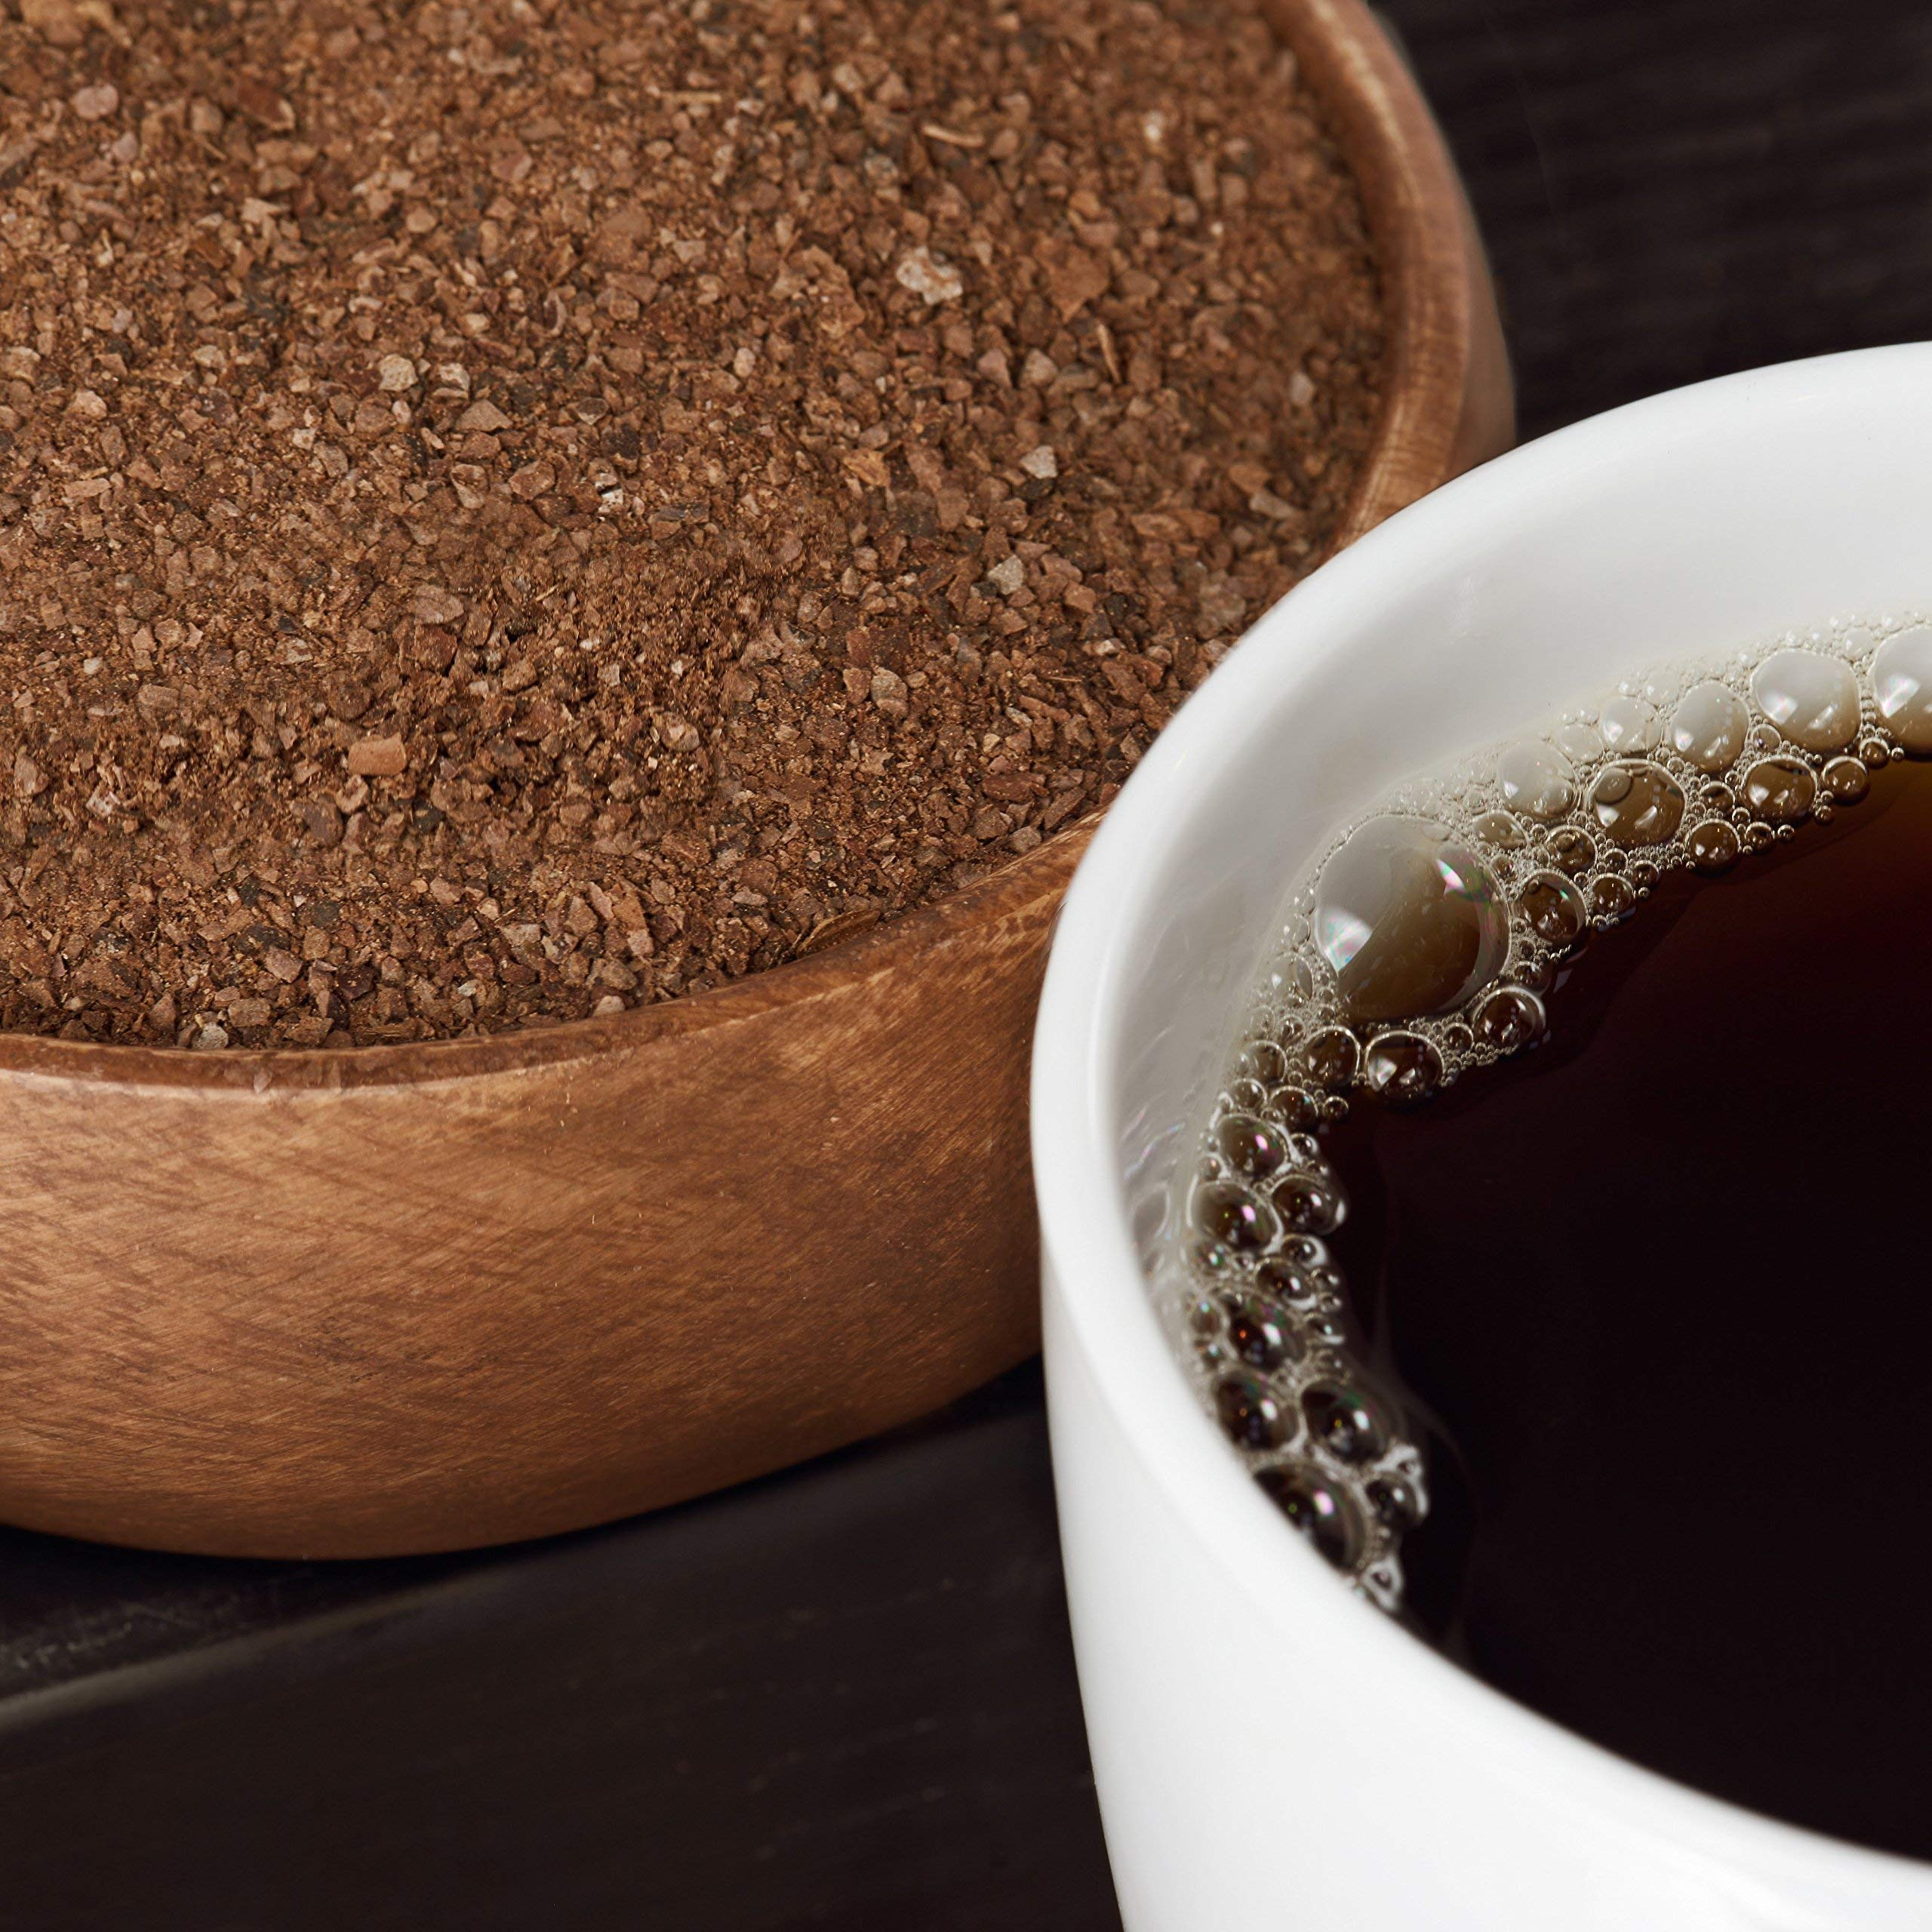 Choffy, Volta, Brewed Chocolate, Cocoa, Medium Roast, 12 oz.